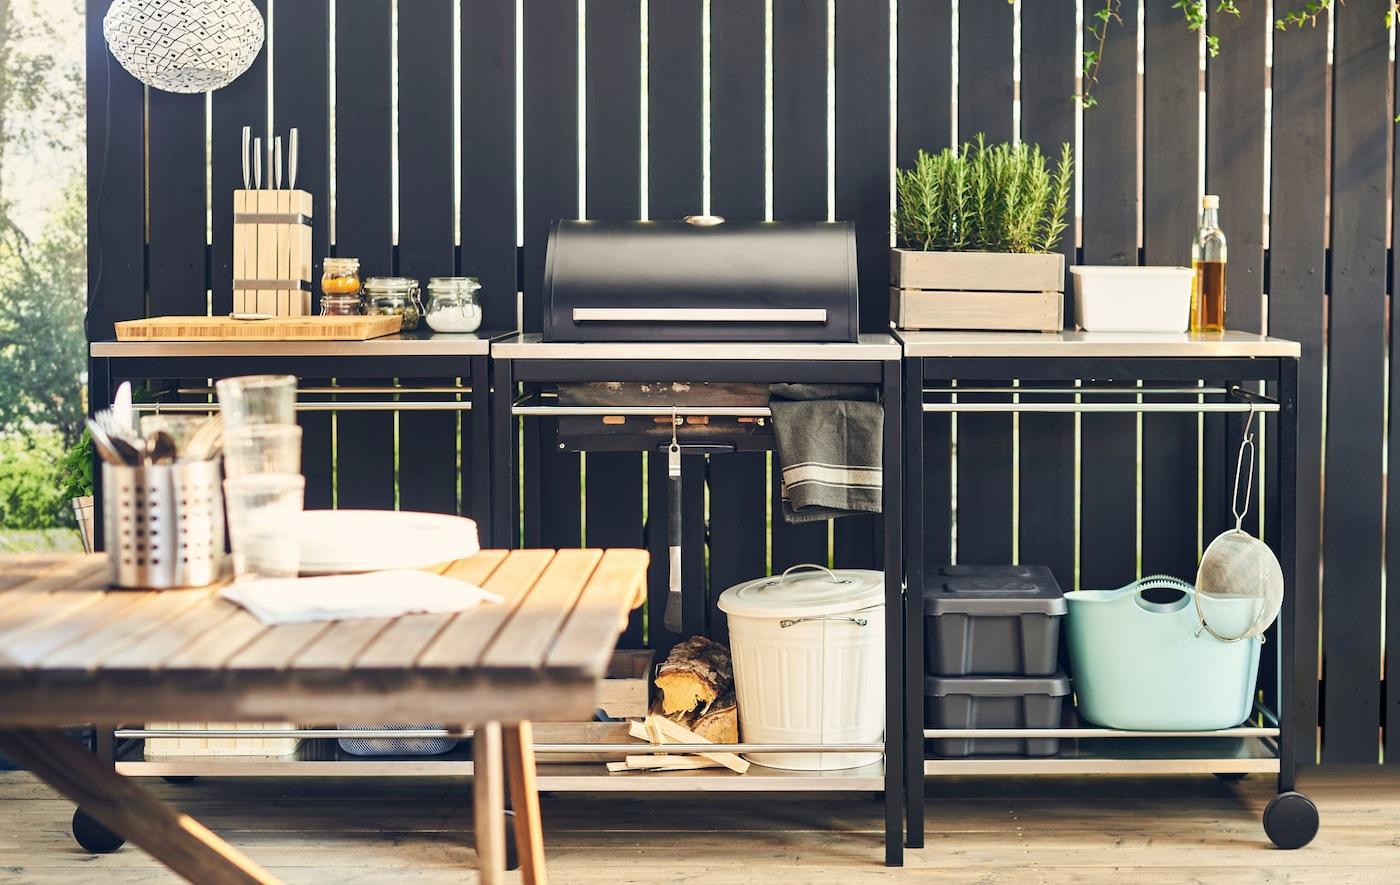 Create a garden kitchen  Outdoor dining ideas - IKEA